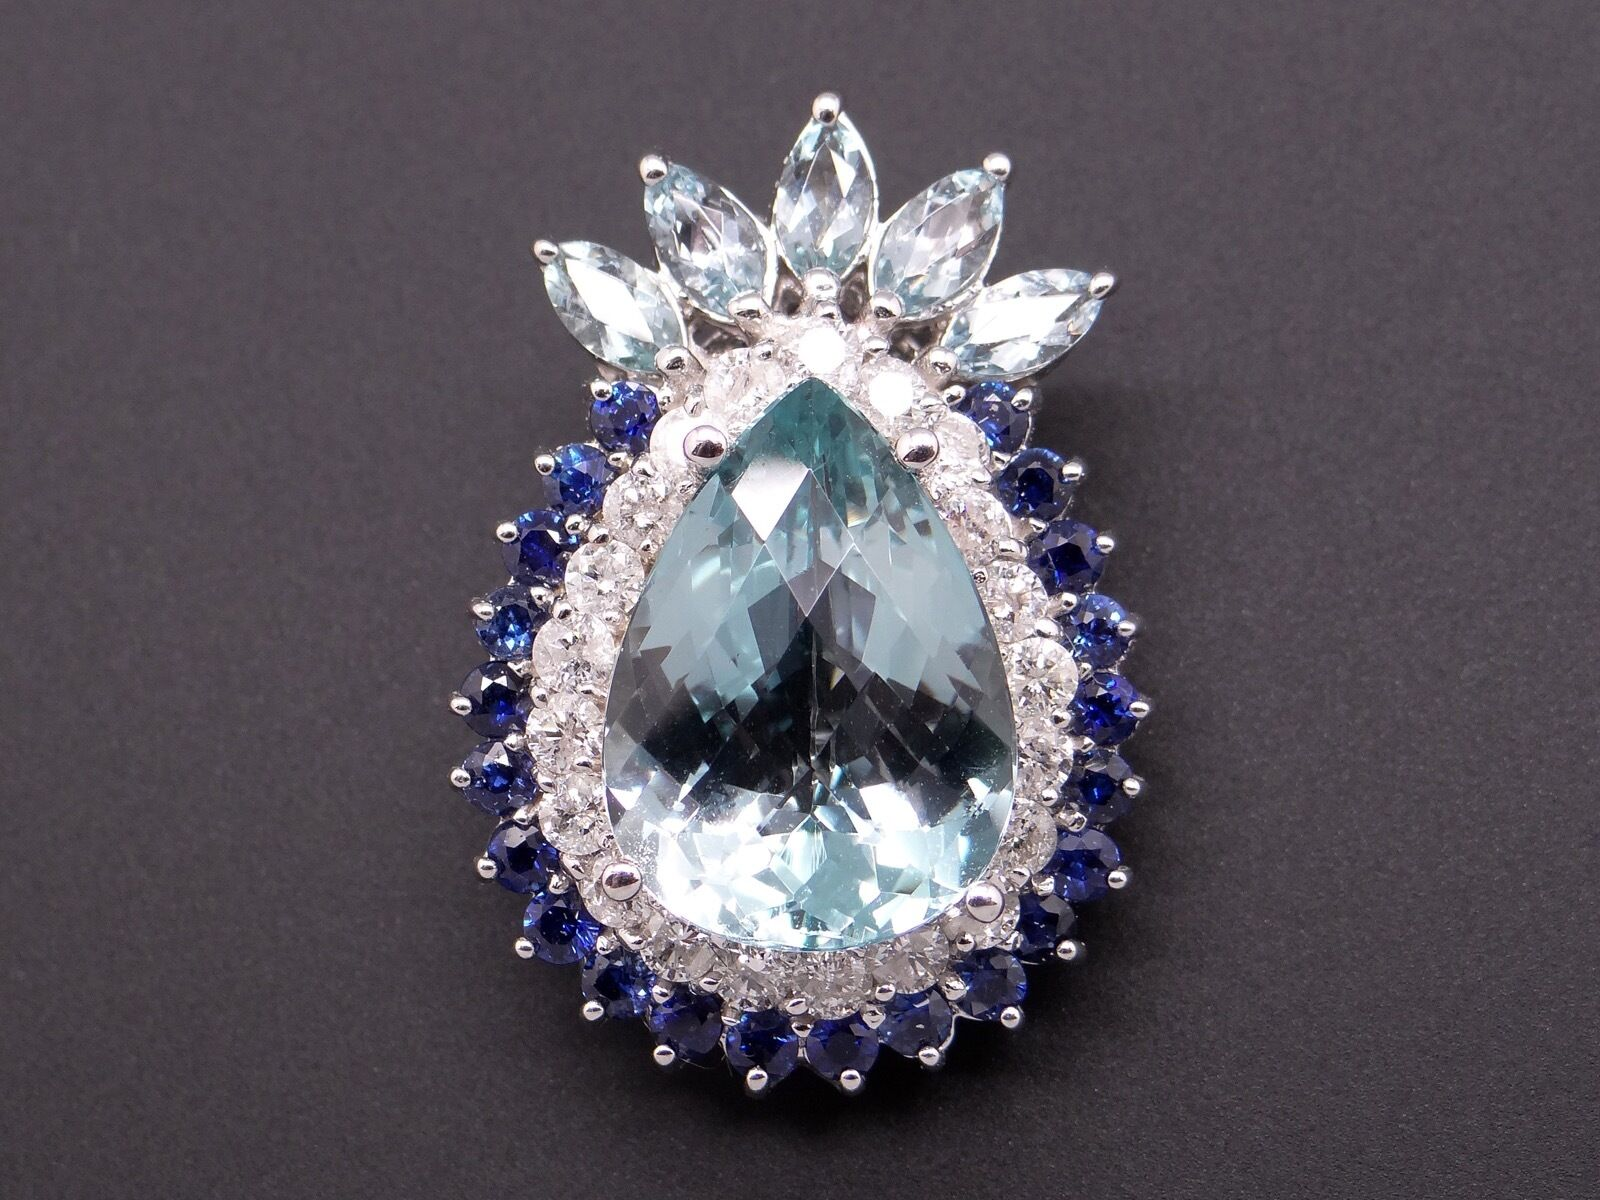 14k White gold 15.75ct Pear Round bluee Topaz Sapphire Diamond Pendant Enhancer